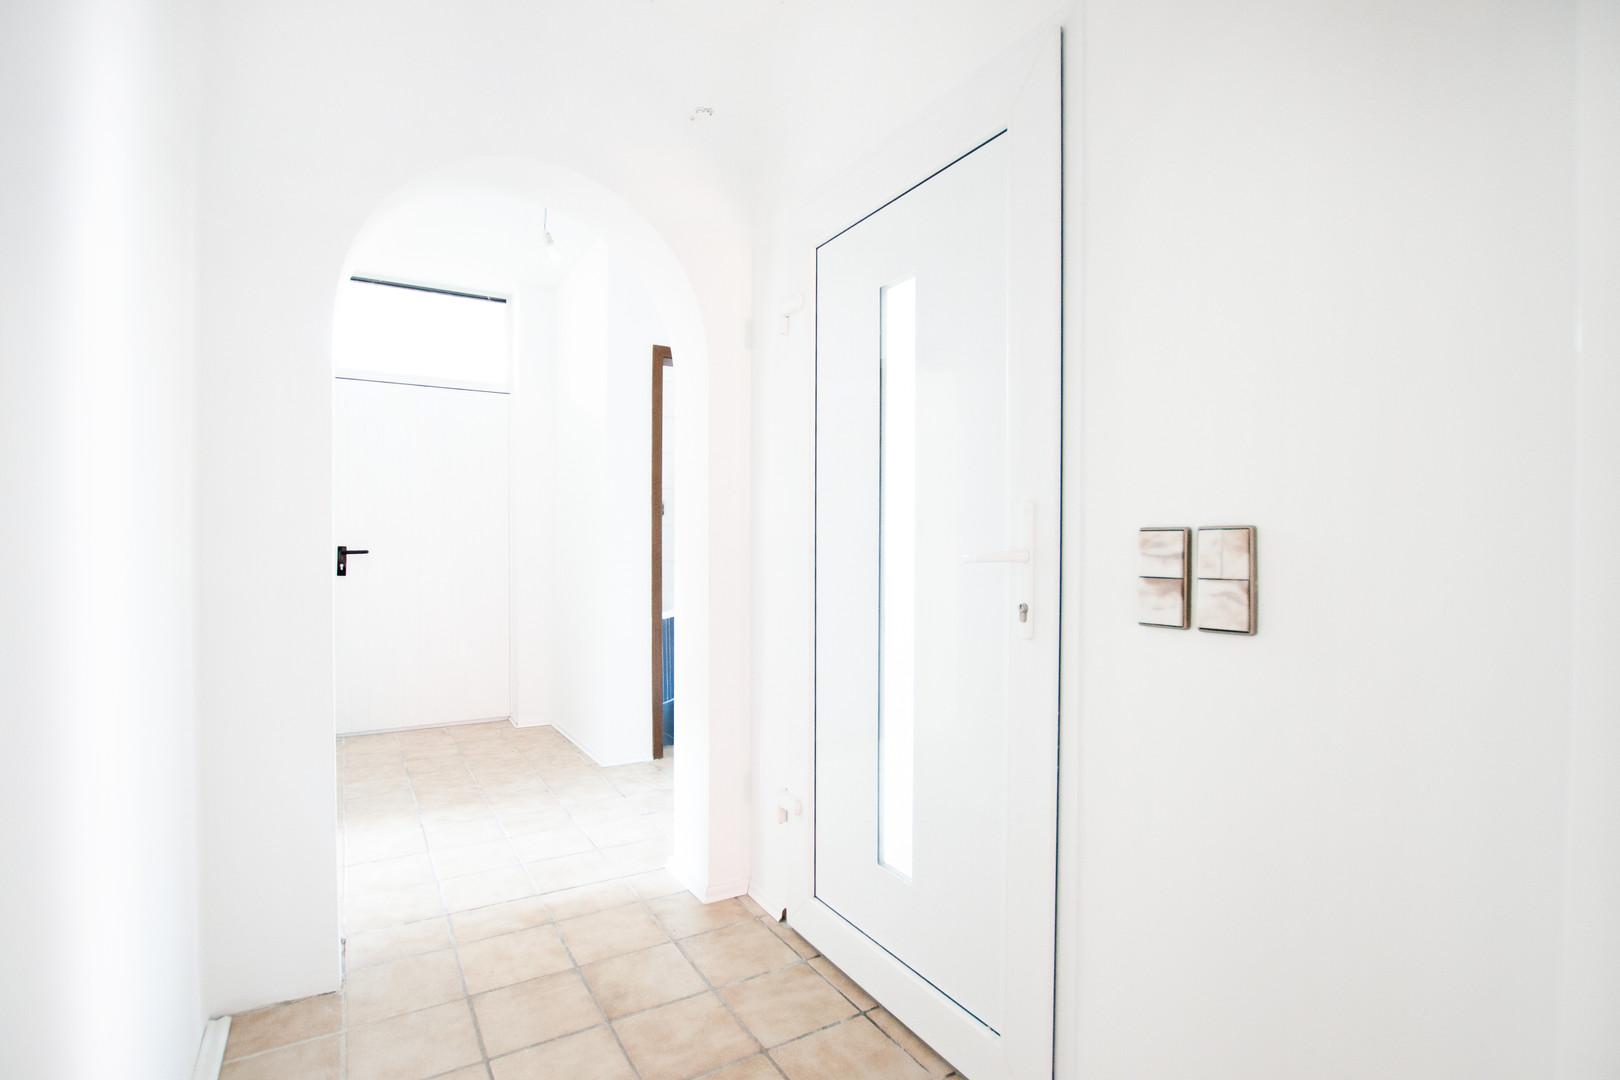 Eingang der Wohnung im Erdgeschoss